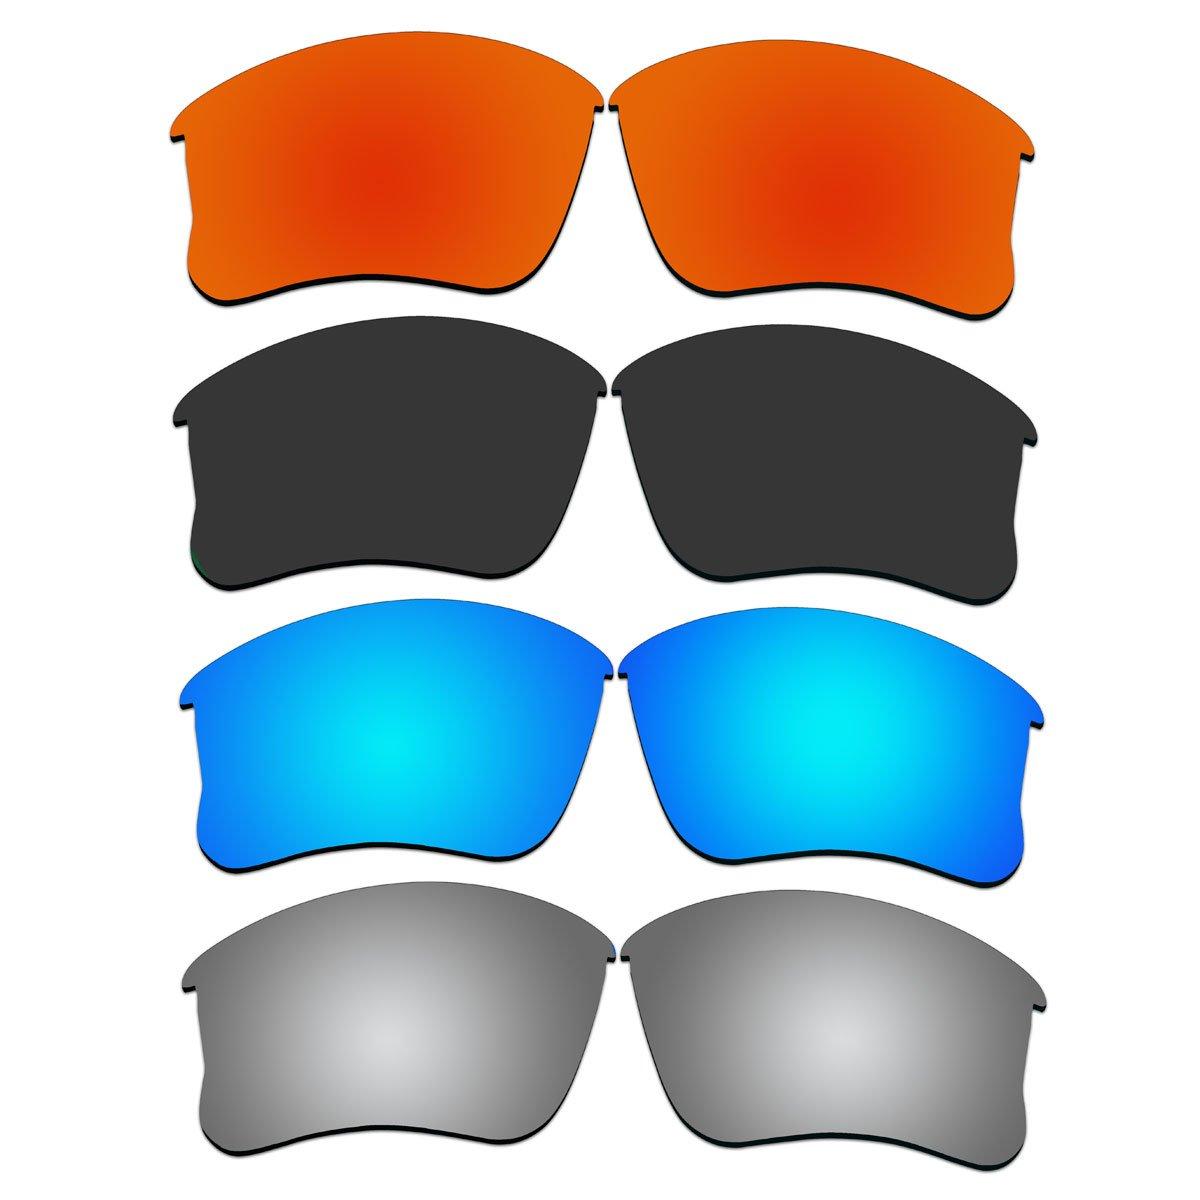 af86e38361 Amazon.com  4 Pair ACOMPATIBLE Replacement Lenses for Oakley Flak Jacket  XLJ Sunglasses With Polarized Pack P3-1 (Not Fit Flak Jacket